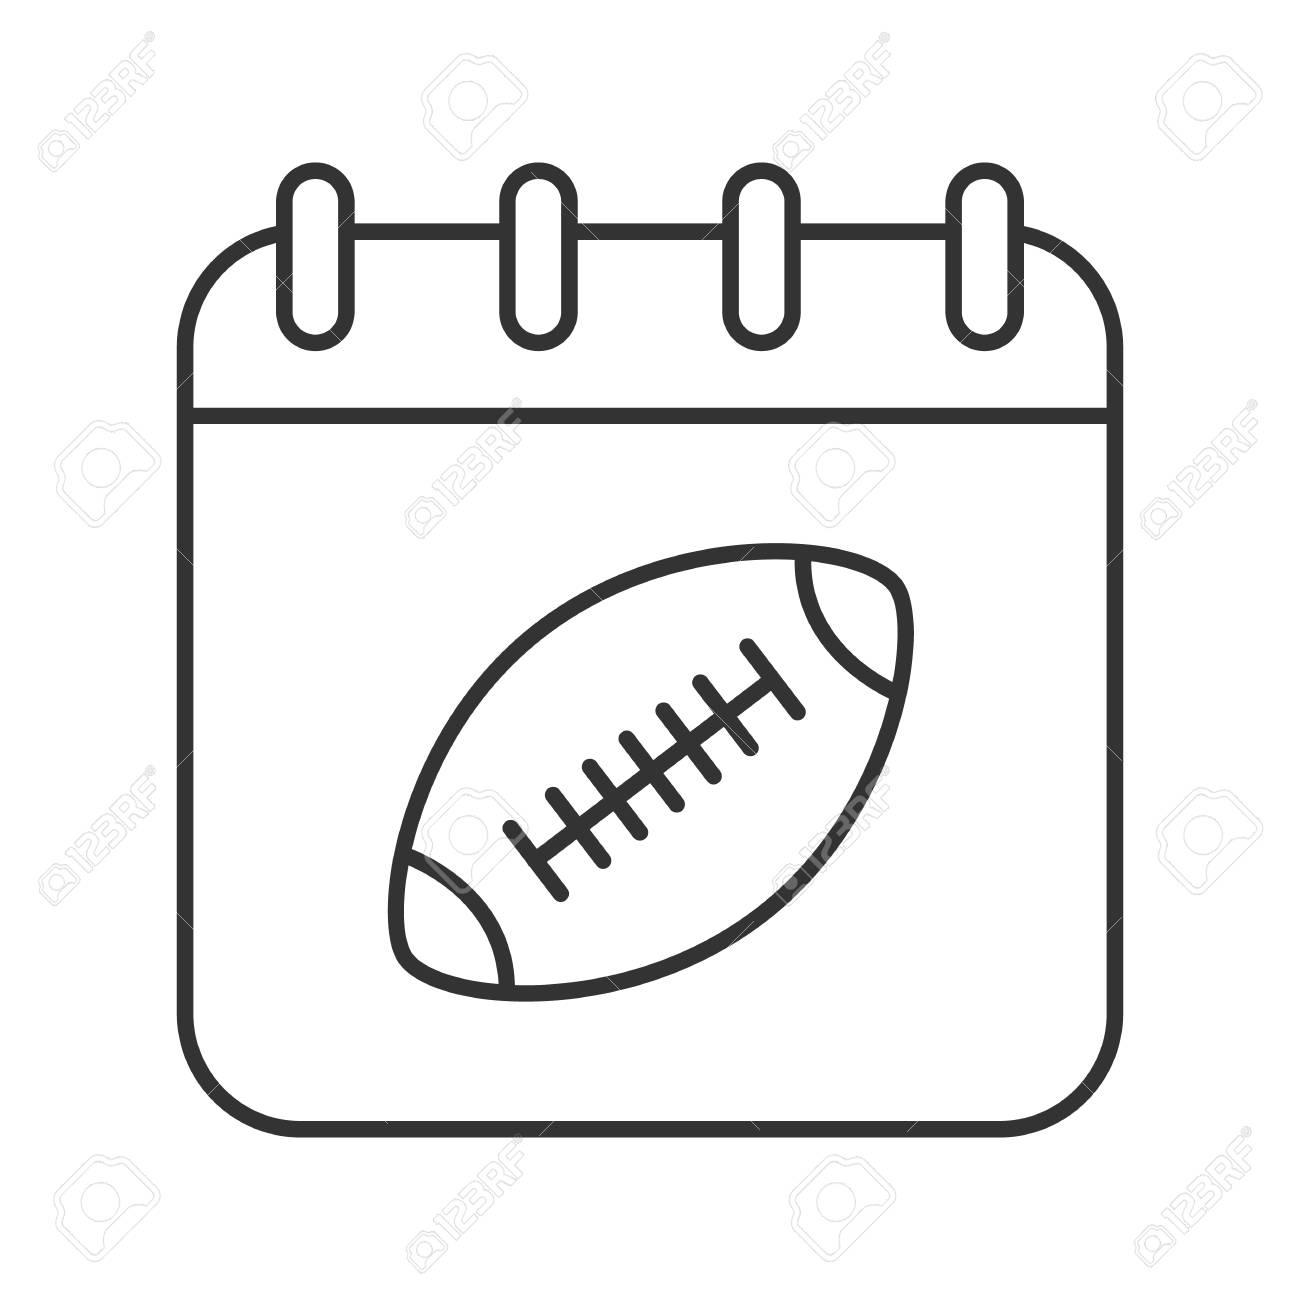 Super Bowl Date Linear Icon Thin Line Illustration Calendar